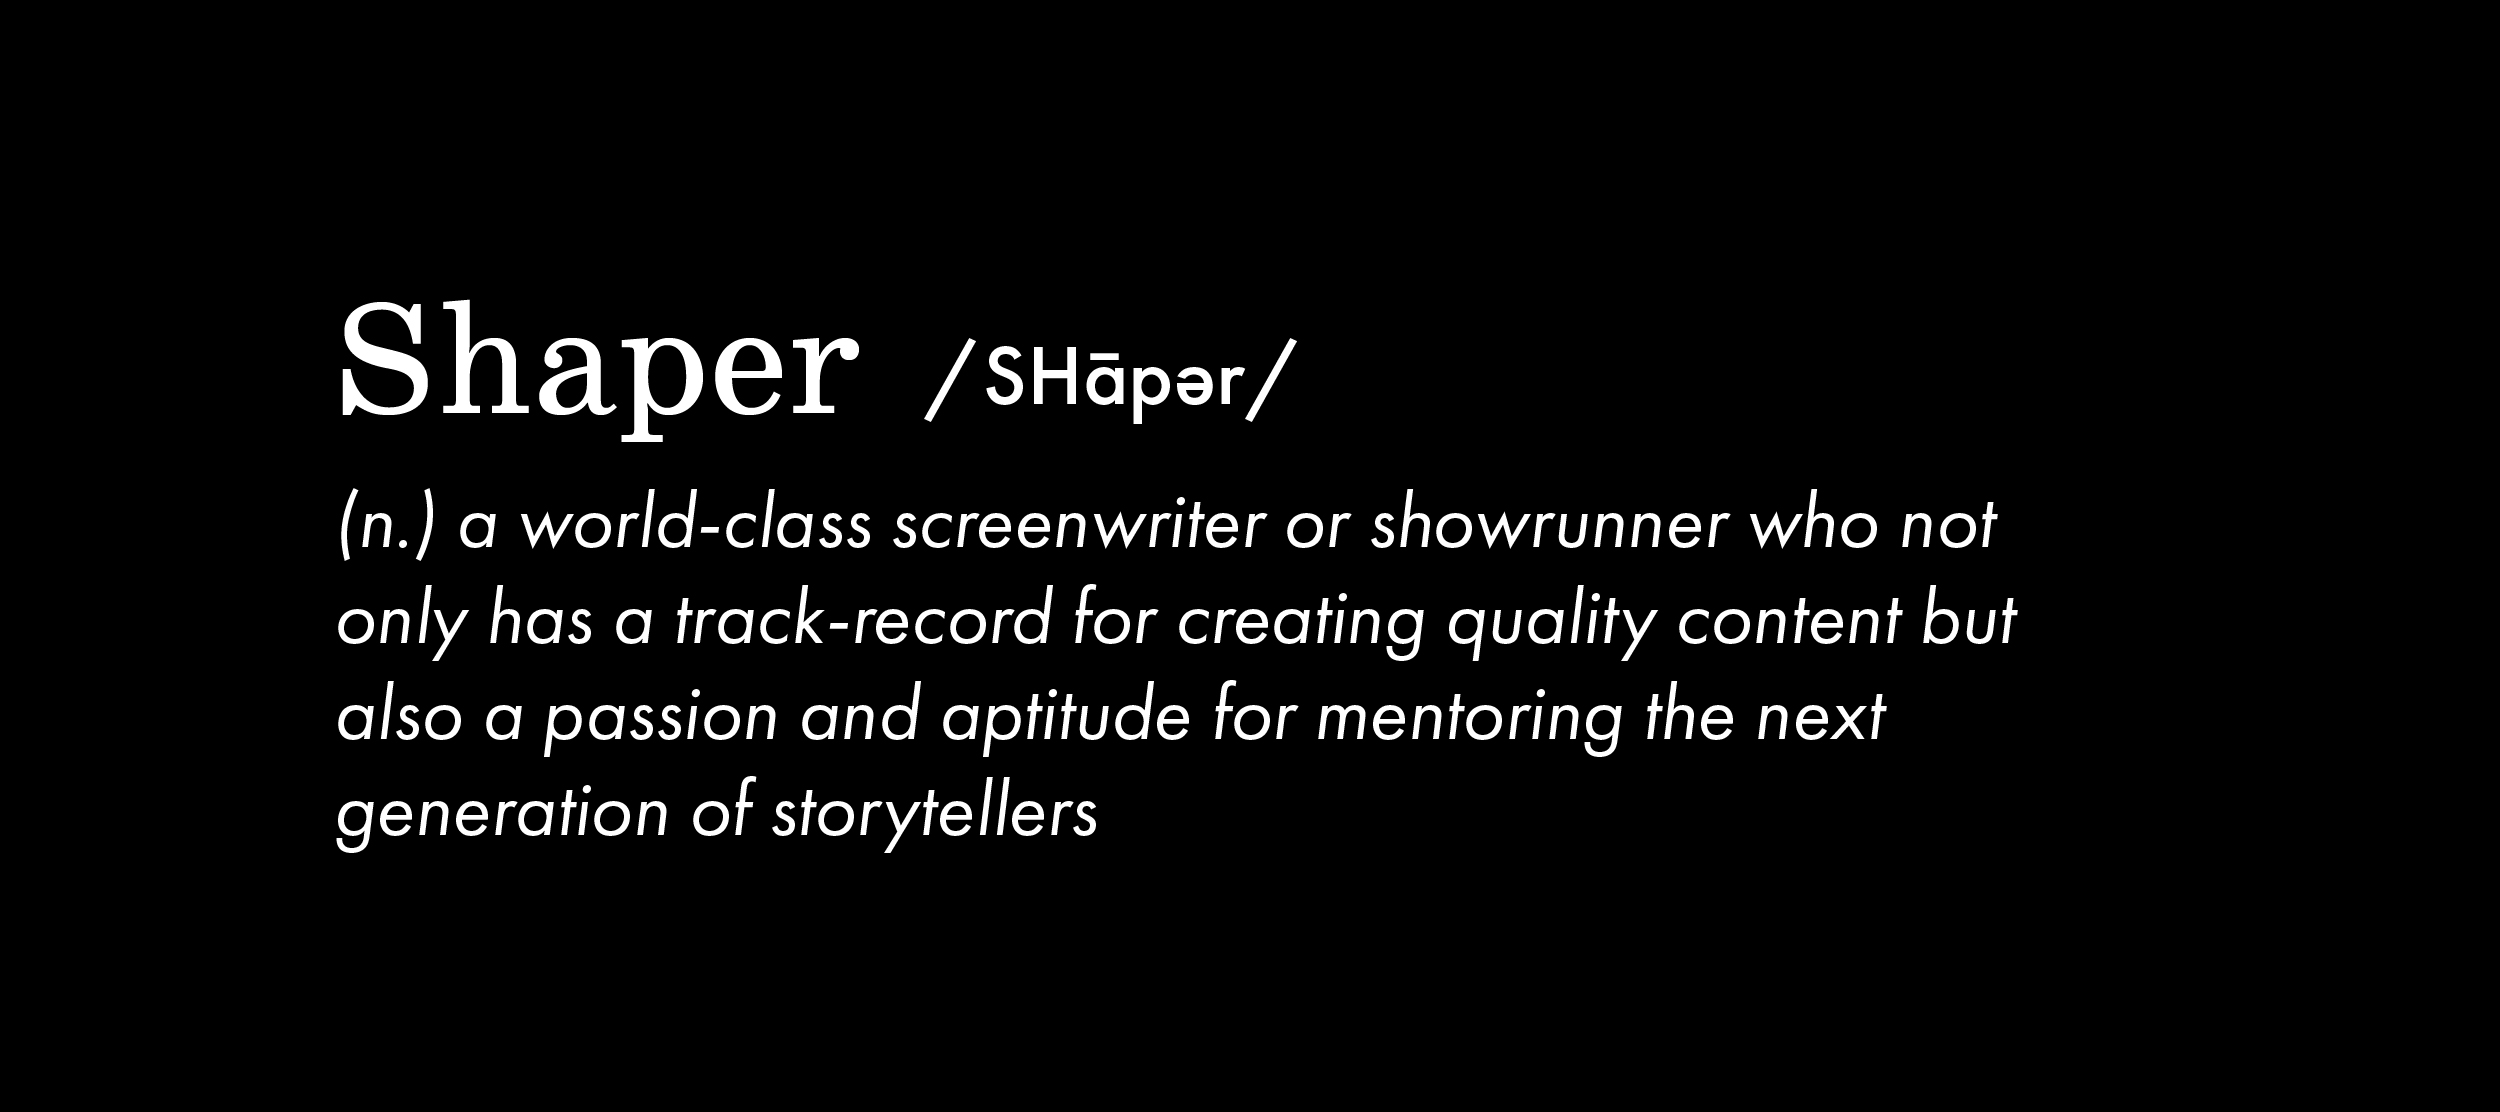 Definitions_Shaper_v02_Shaper.jpg